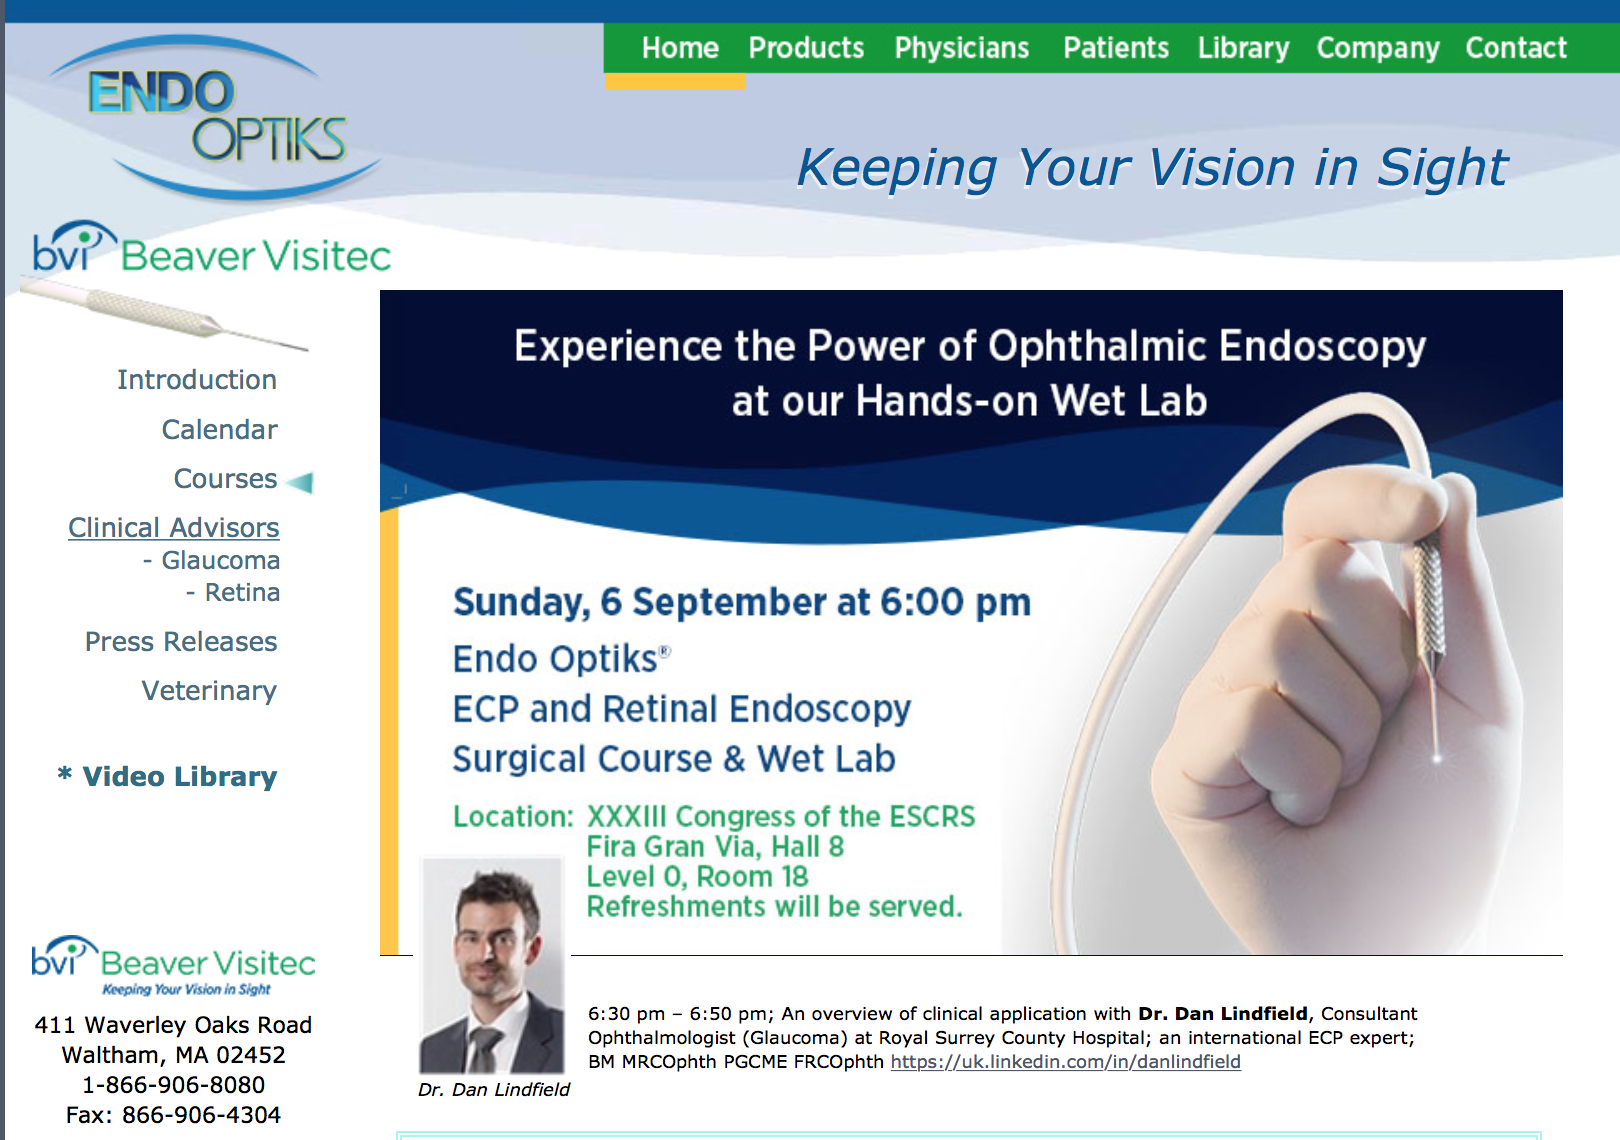 ECP Glaucoma Event in Barcelona - MR DAN LINDFIELD Consultant